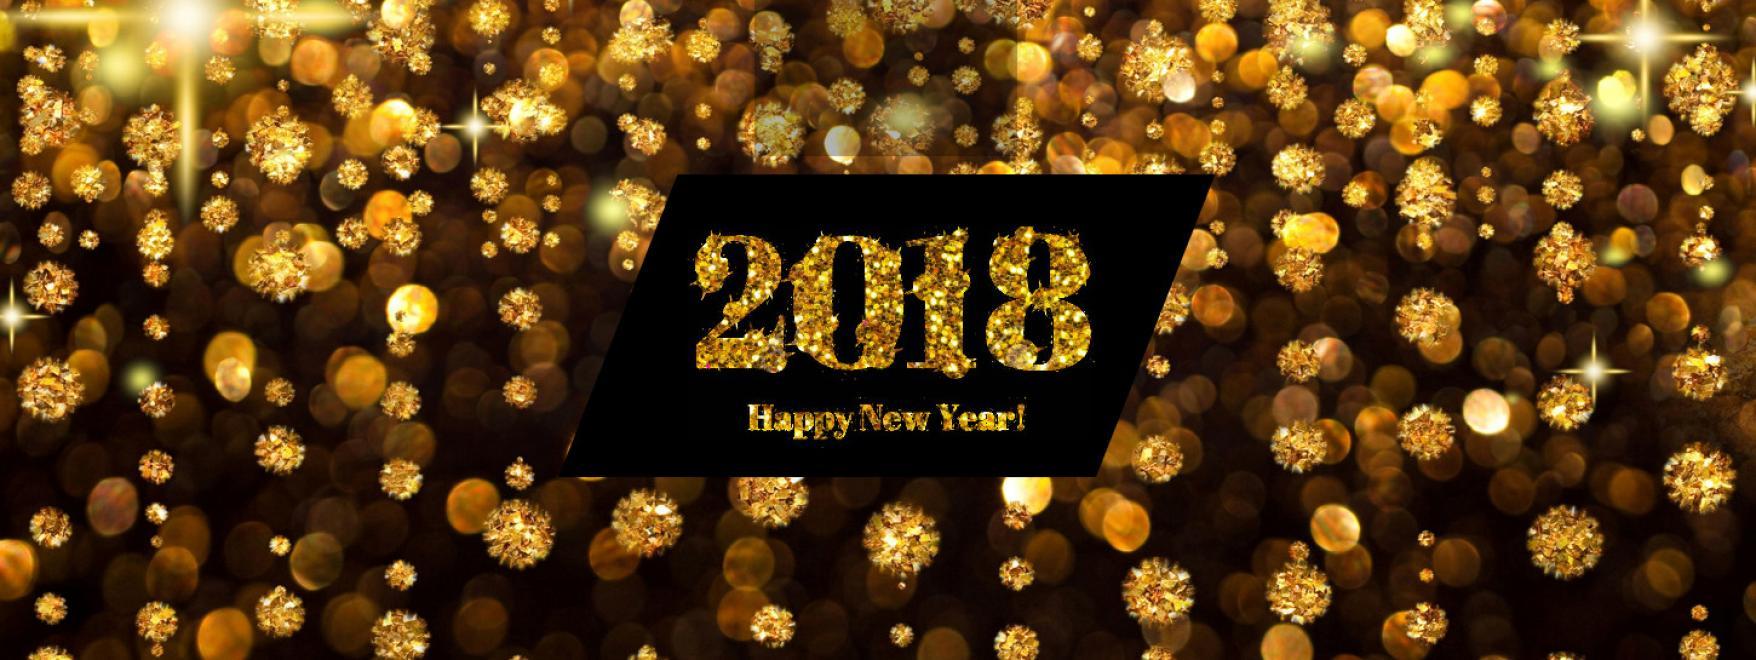 New Year's Eve Matinee New York Comedy Club, New York, NY